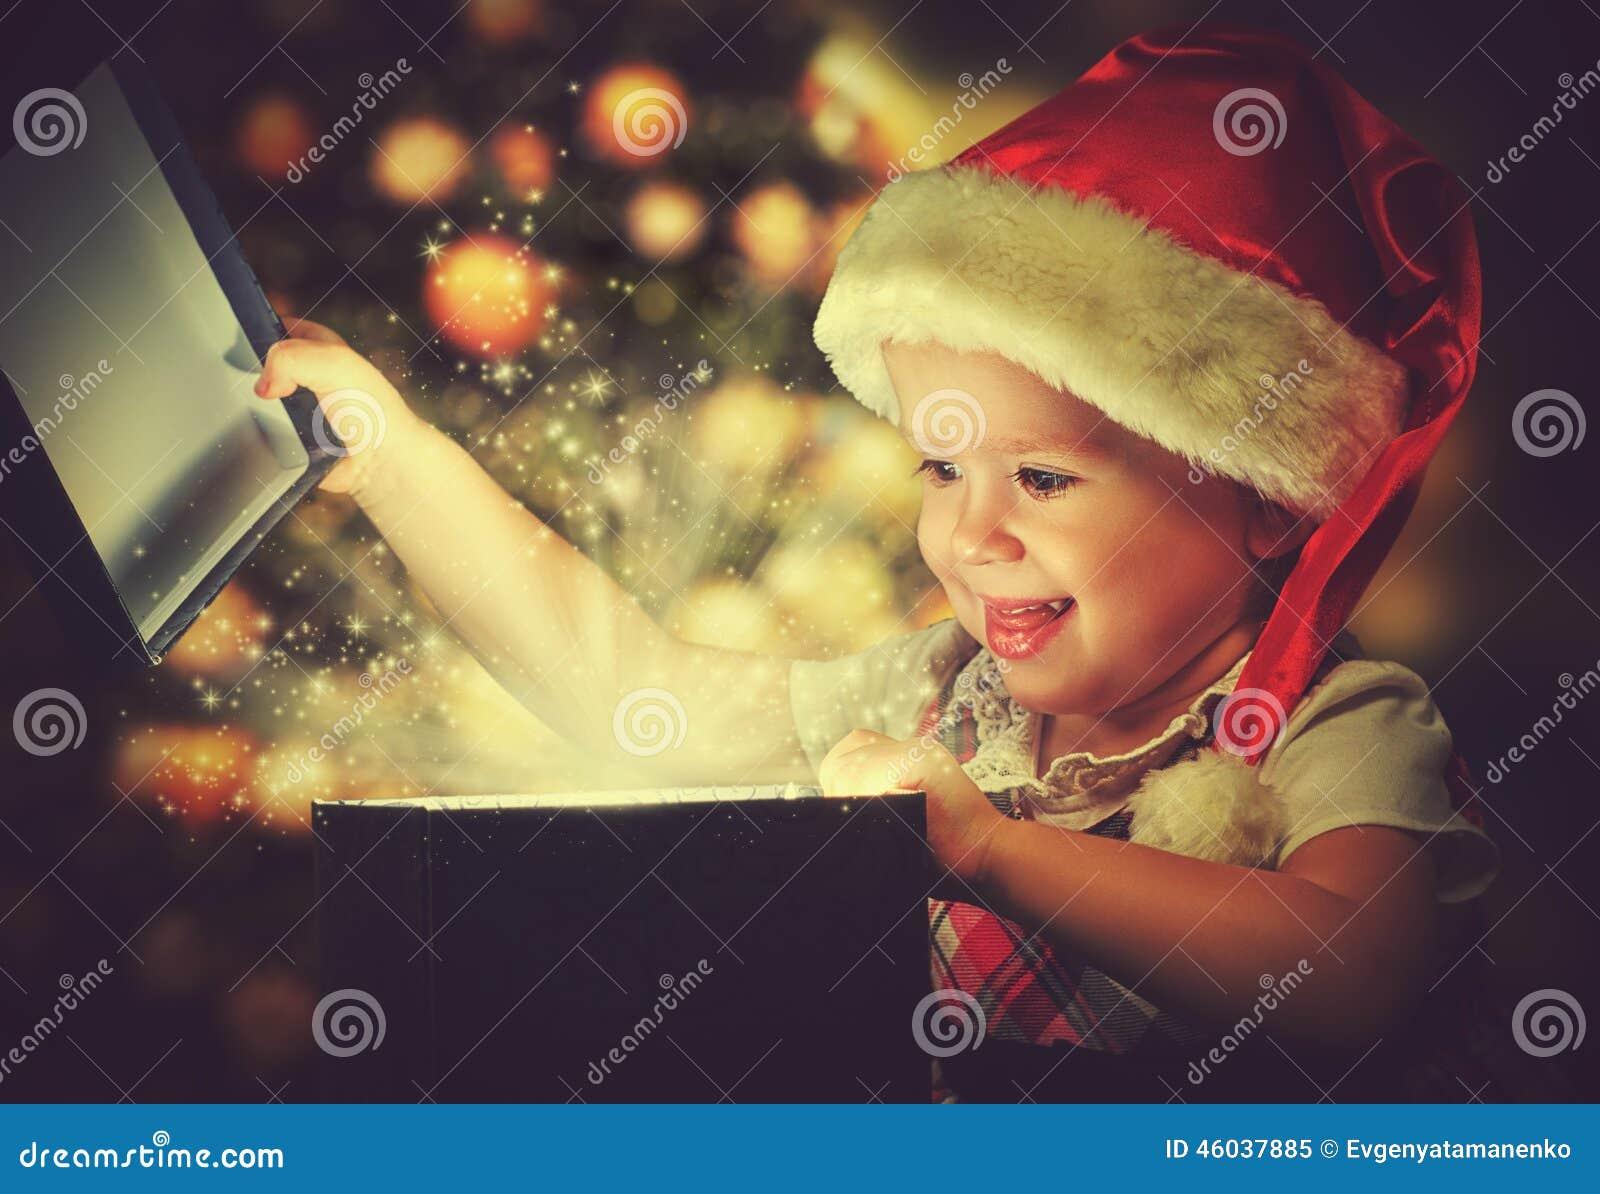 Christmas miracle, magic gift box and child baby girl